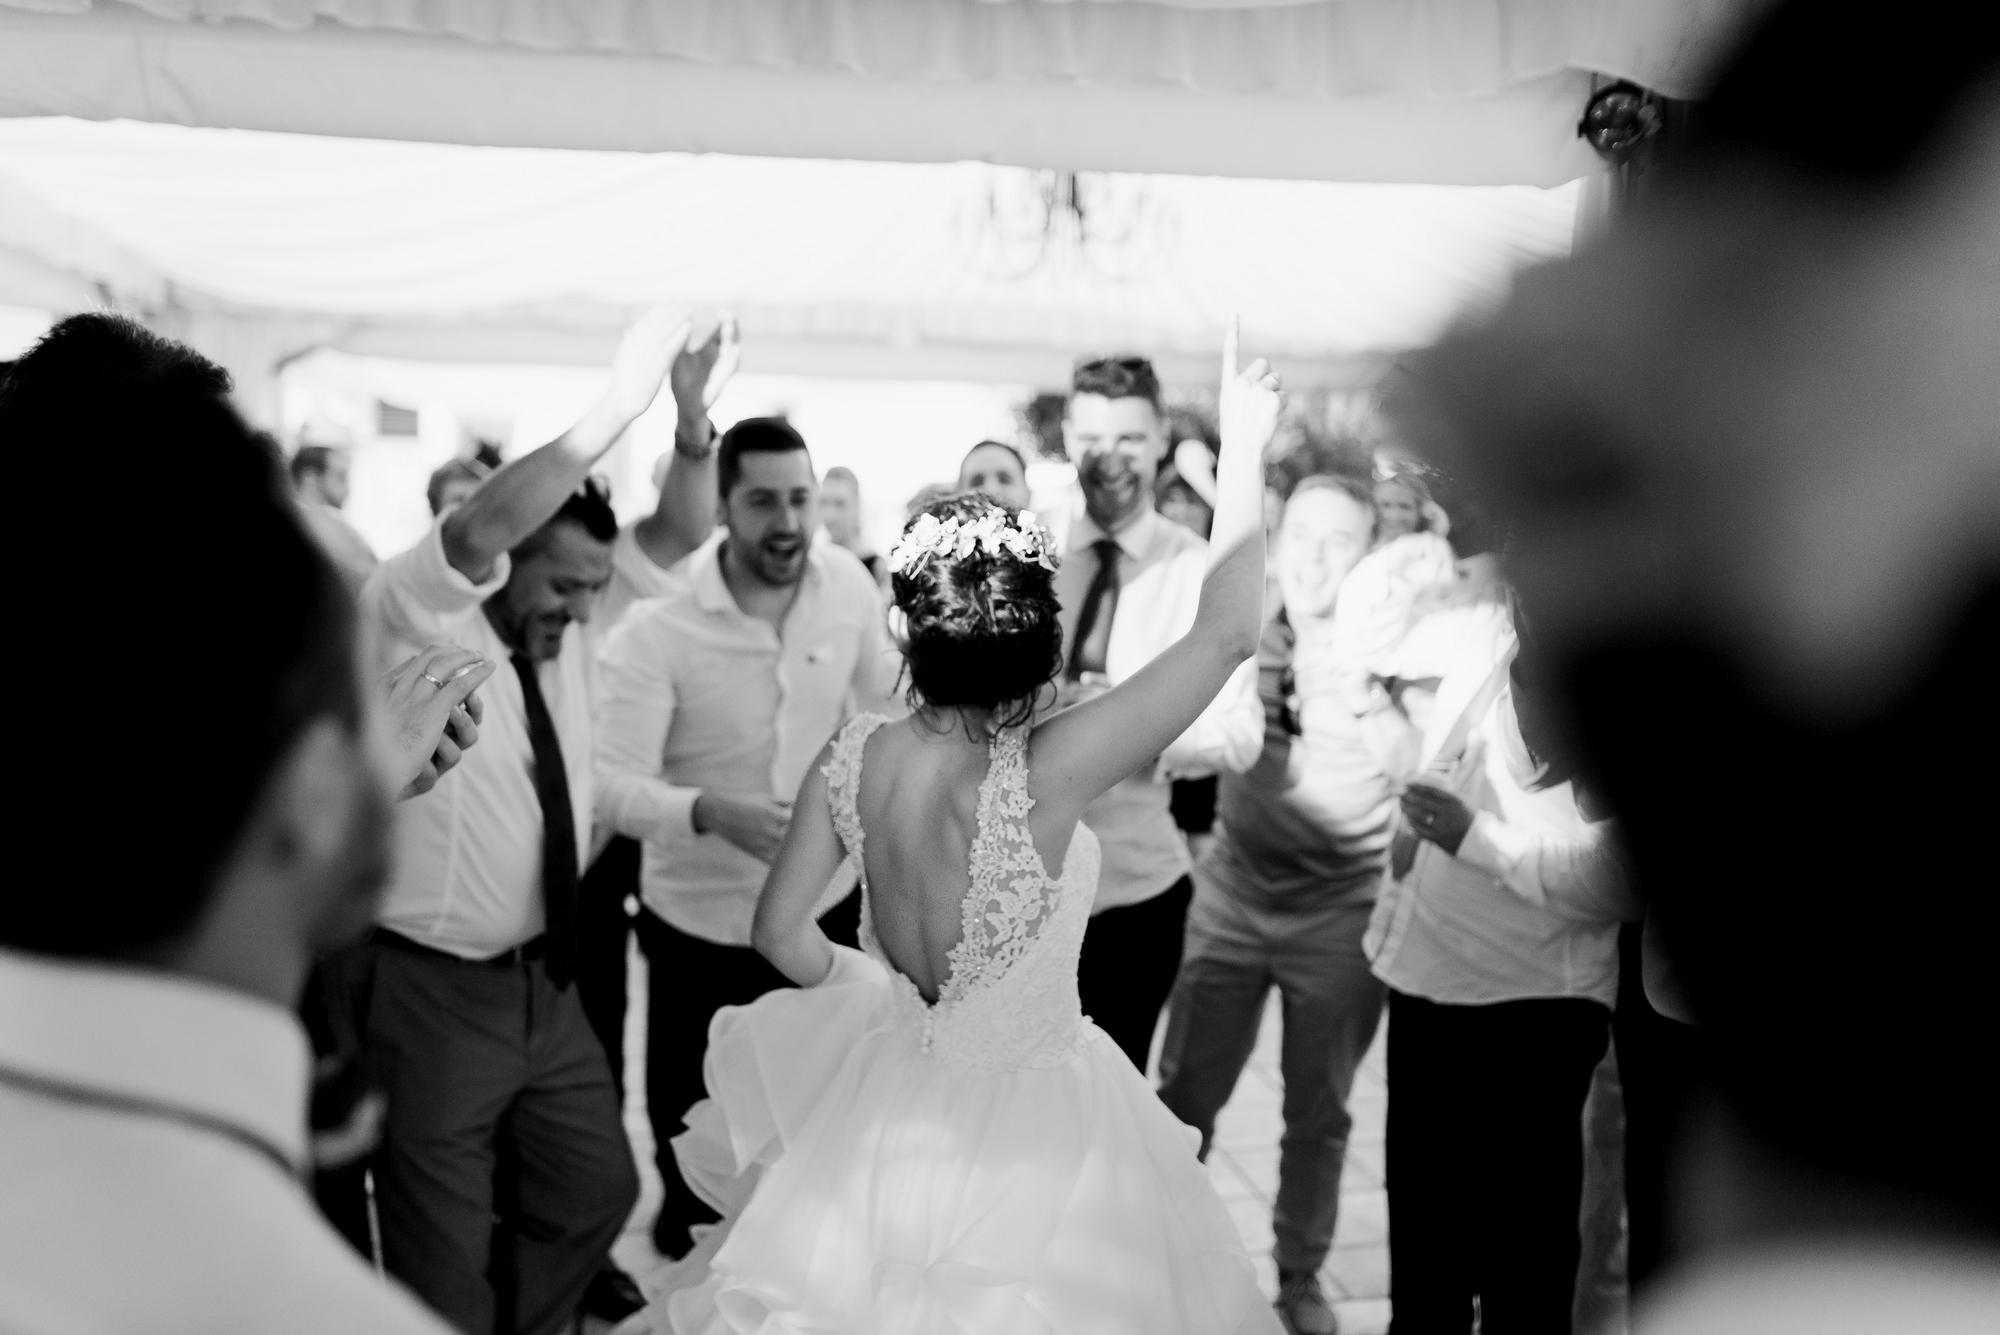 valvanera boda laguardia logroño reportaje villa lucia